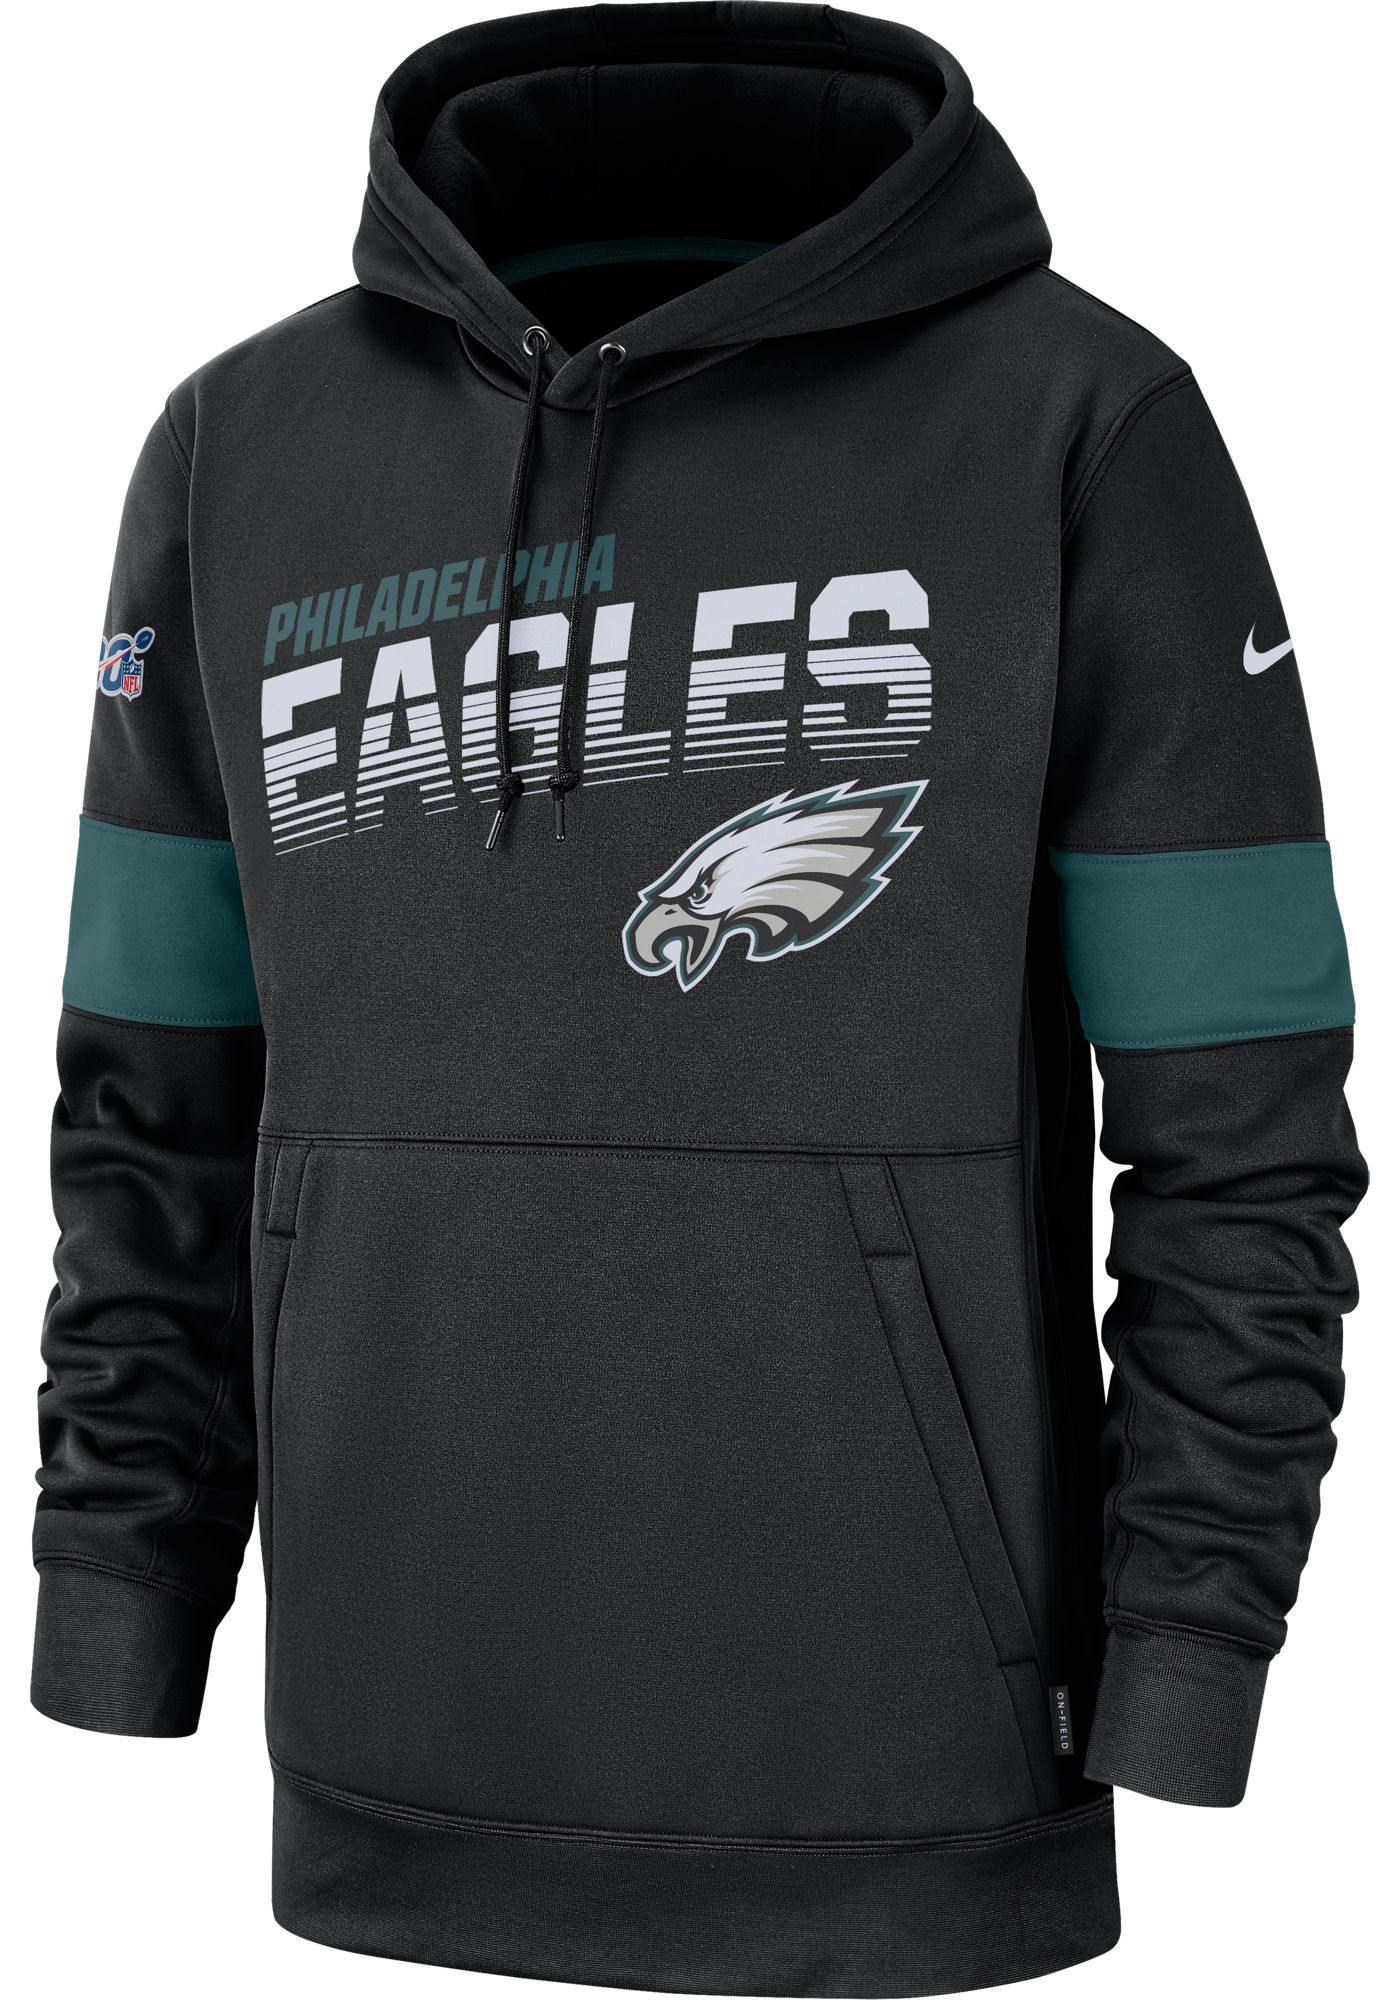 Nike Men's Philadelphia Eagles 100th Sideline Therma-FIT Black Pullover Hoodie